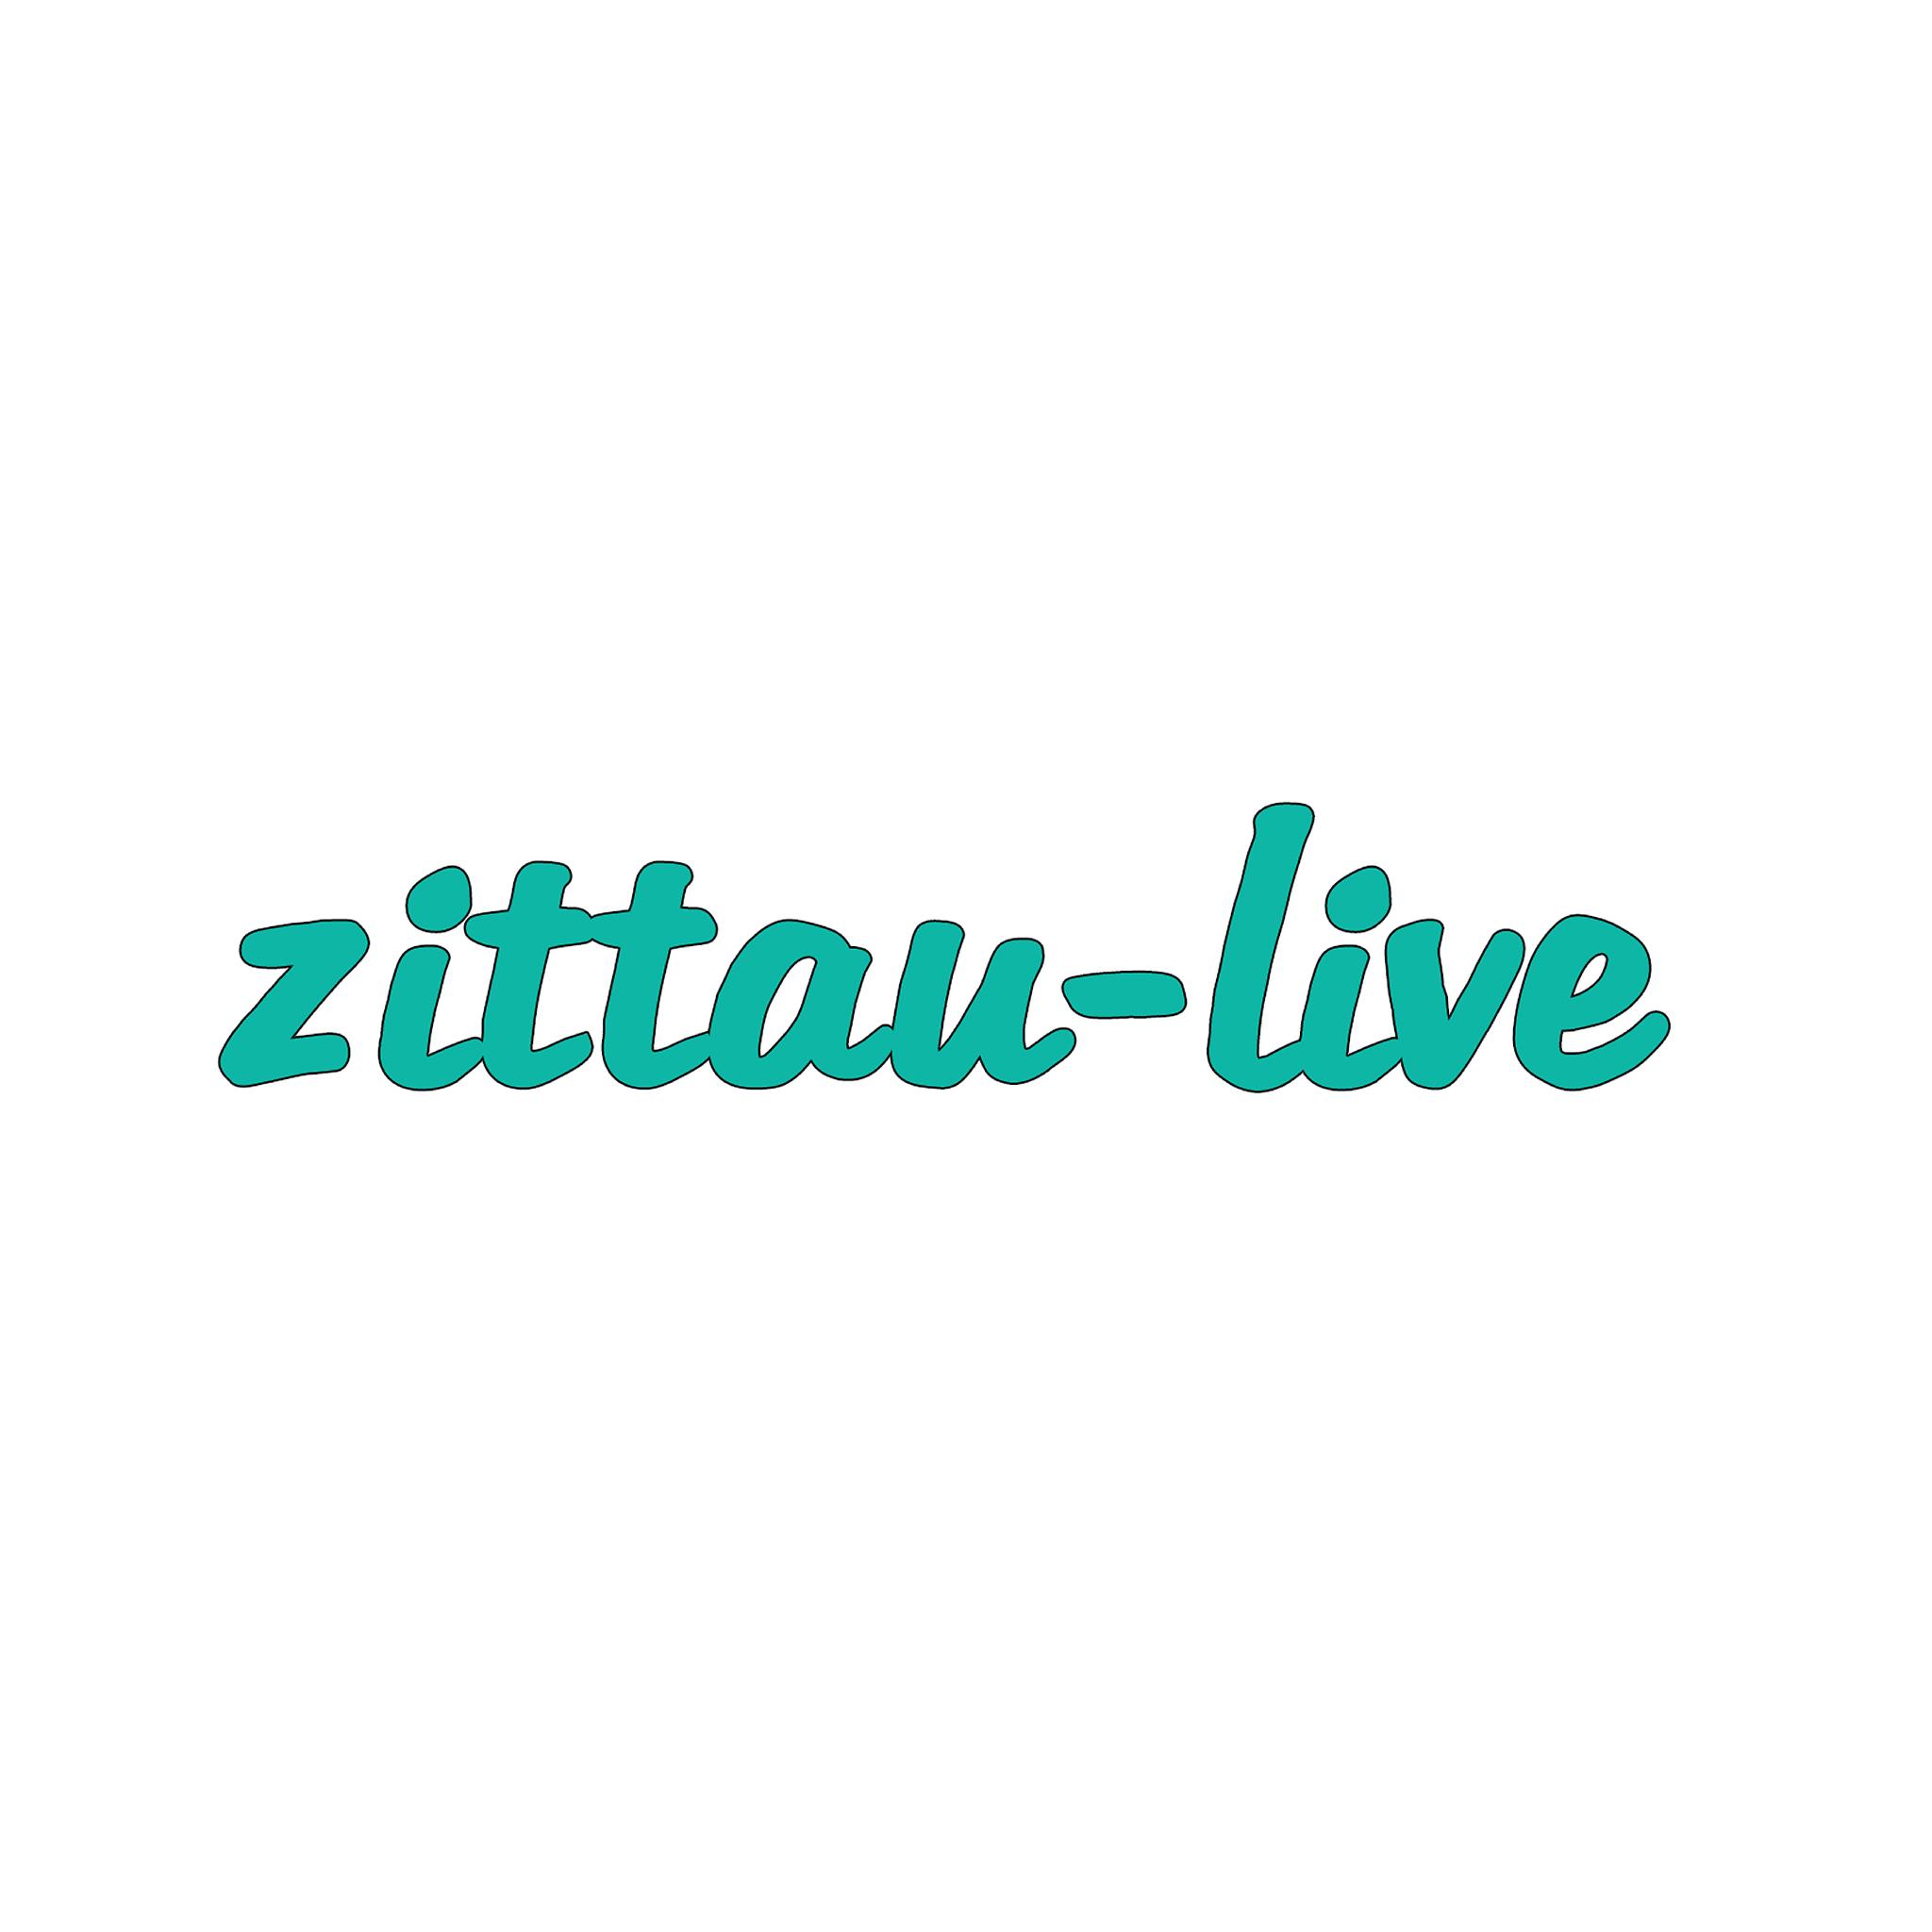 www.zittau-live.de